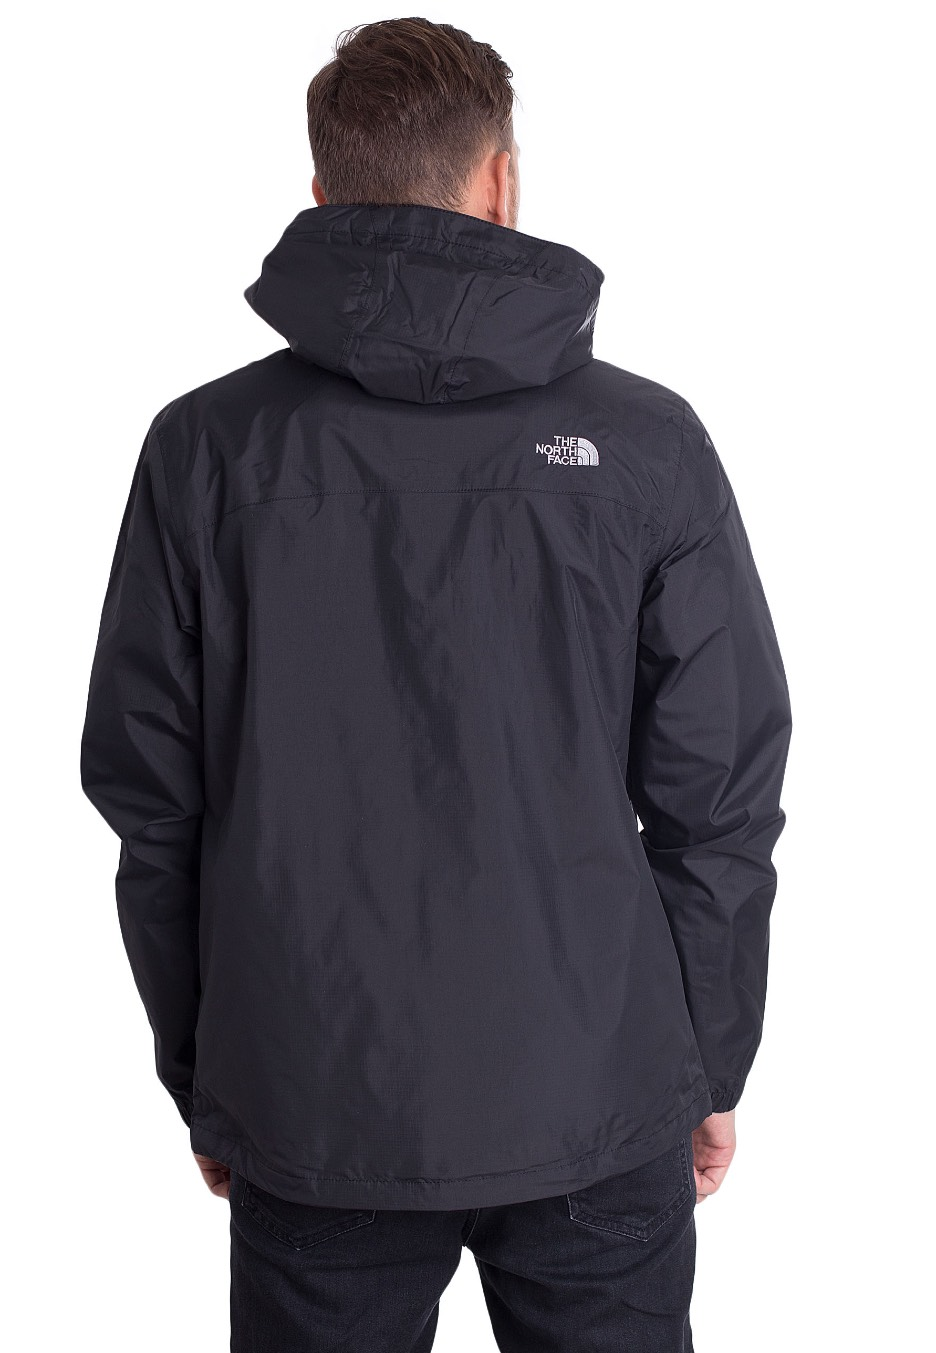 2 Shop North Streetwear The Face Resolve Blackblack Jacket wtFf0